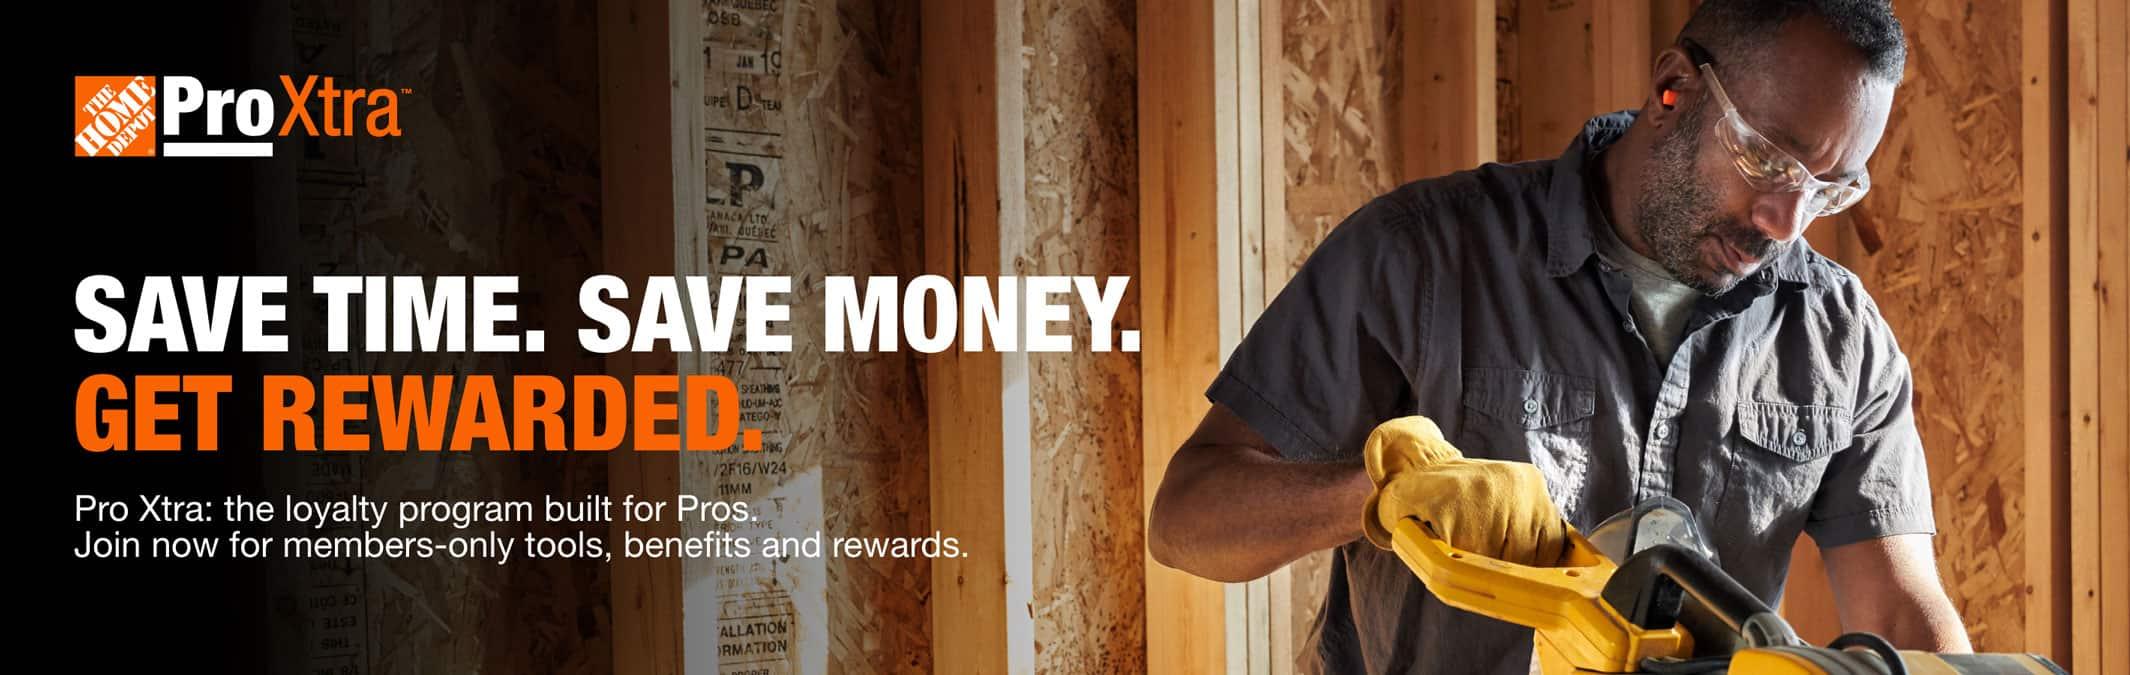 Save time. Save money. Get rewarded.